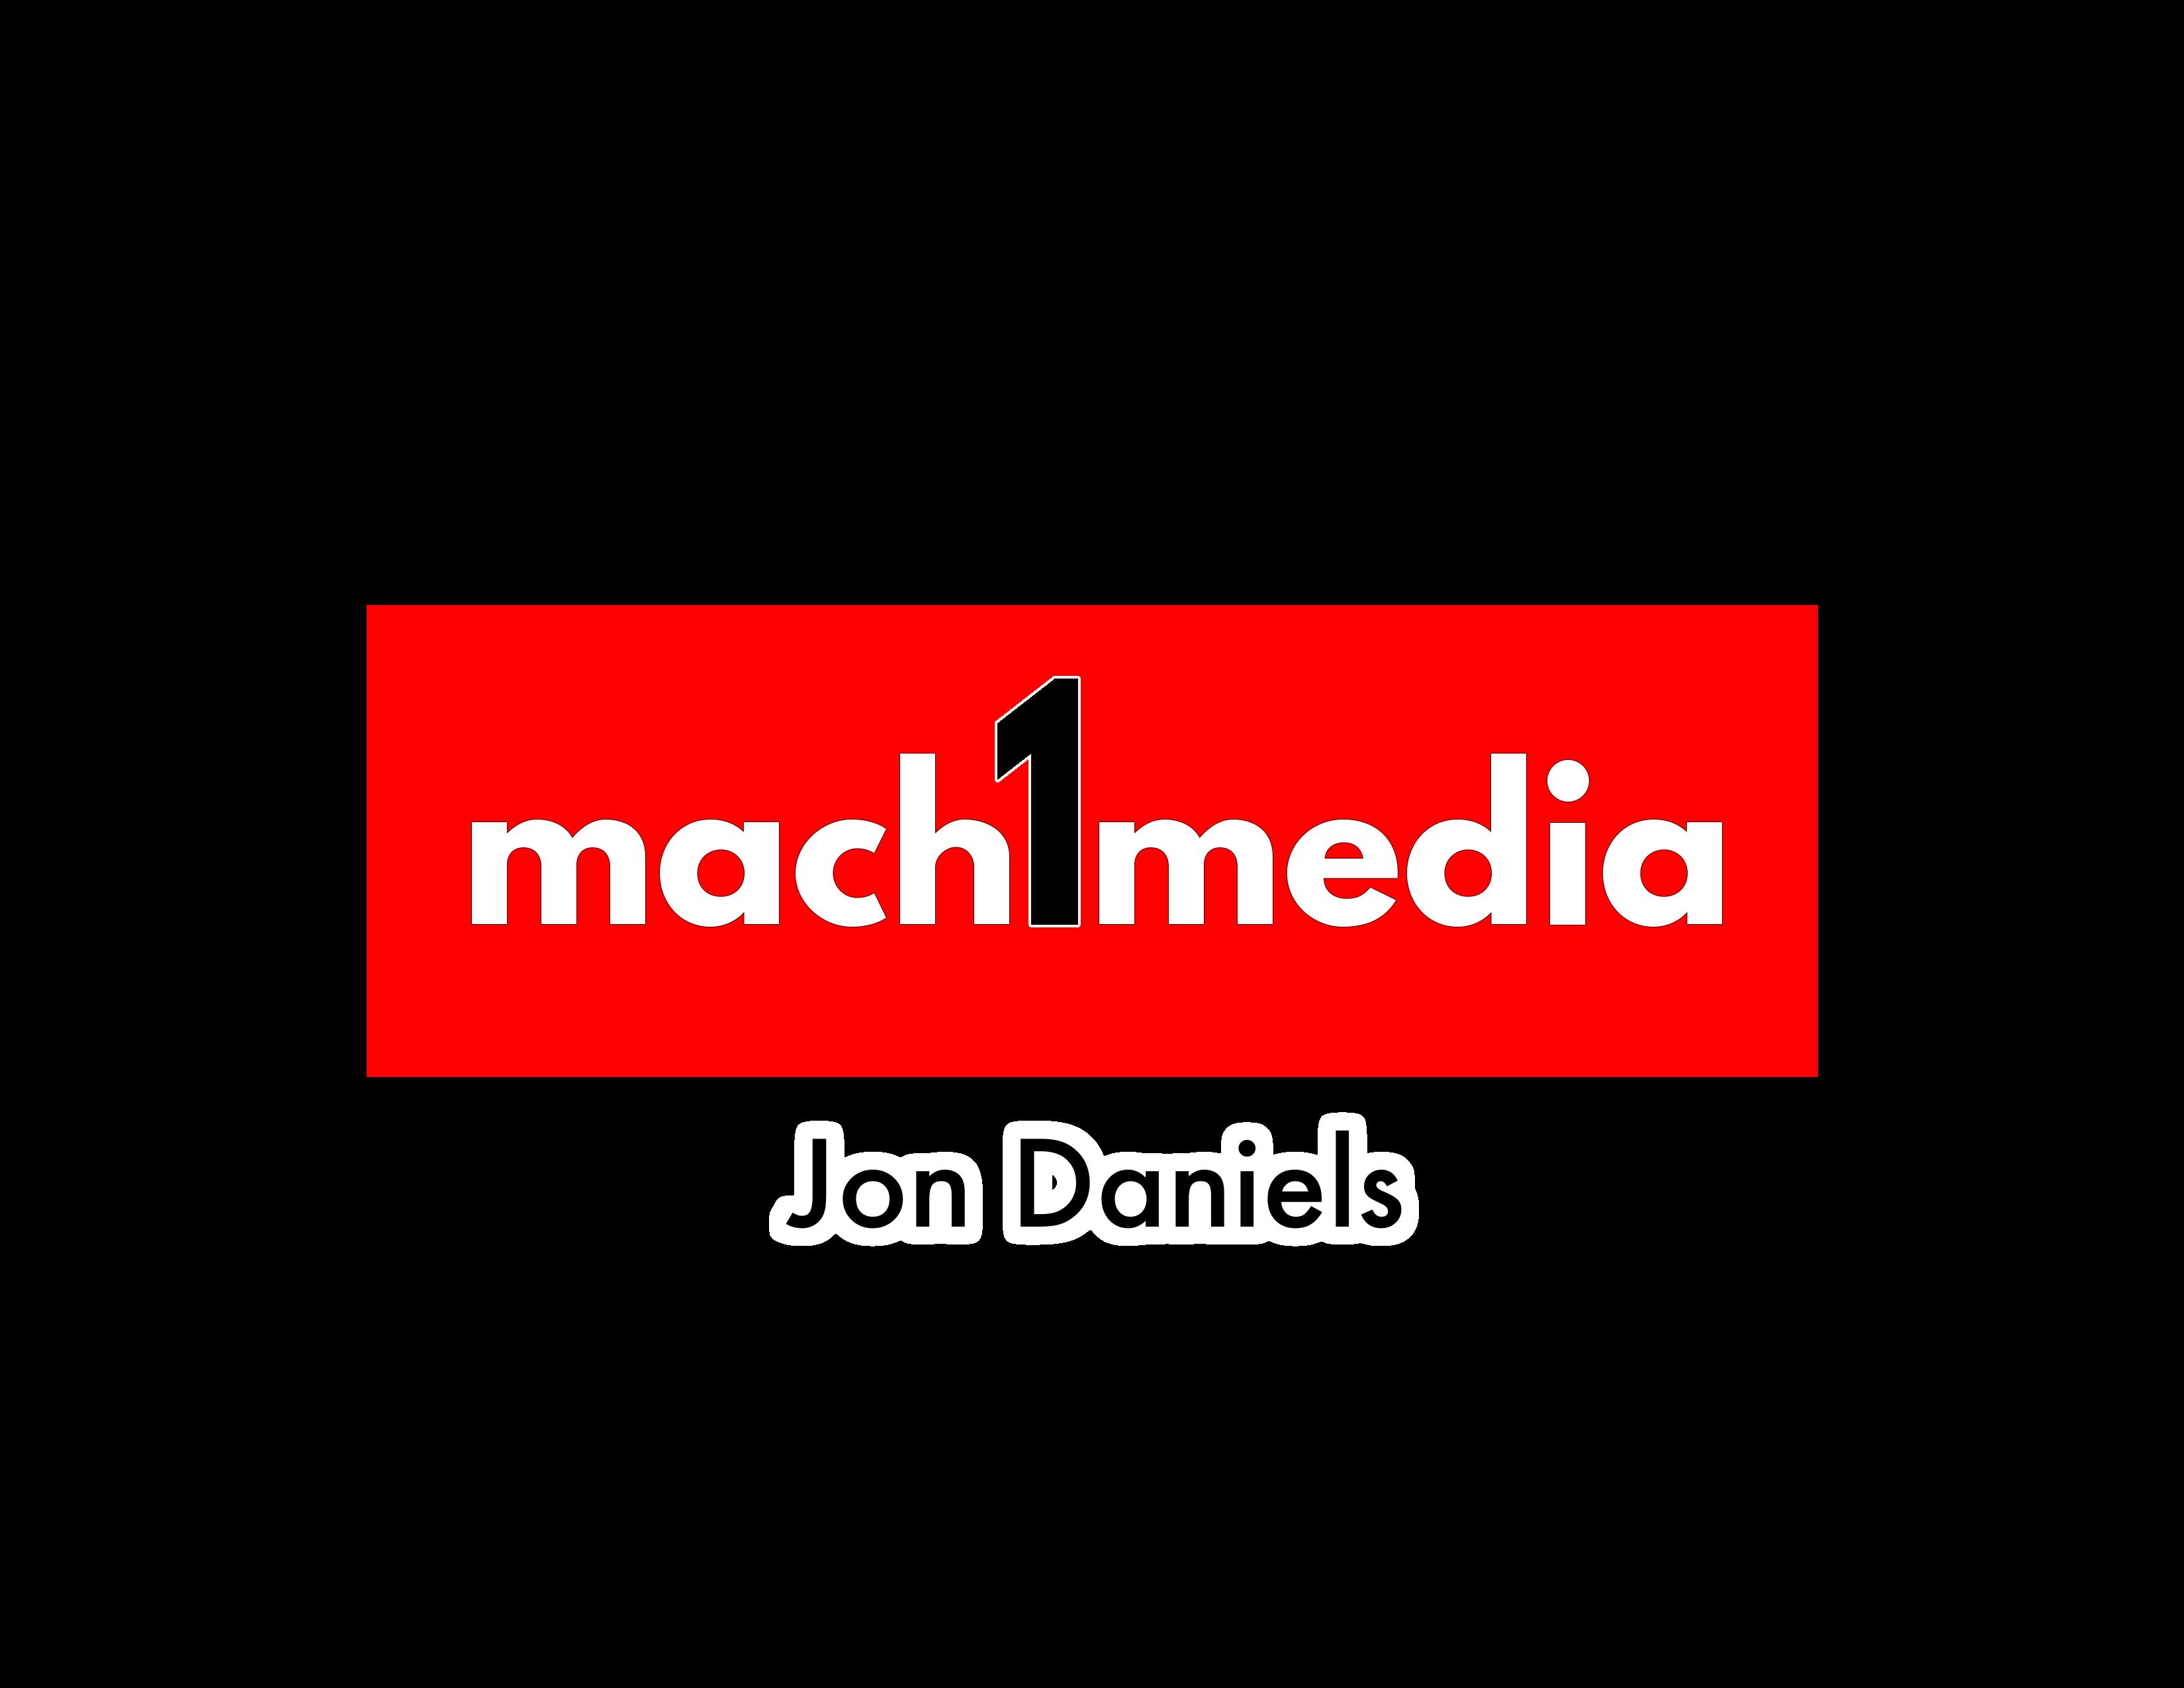 Go to Jonathan Daniels's profile